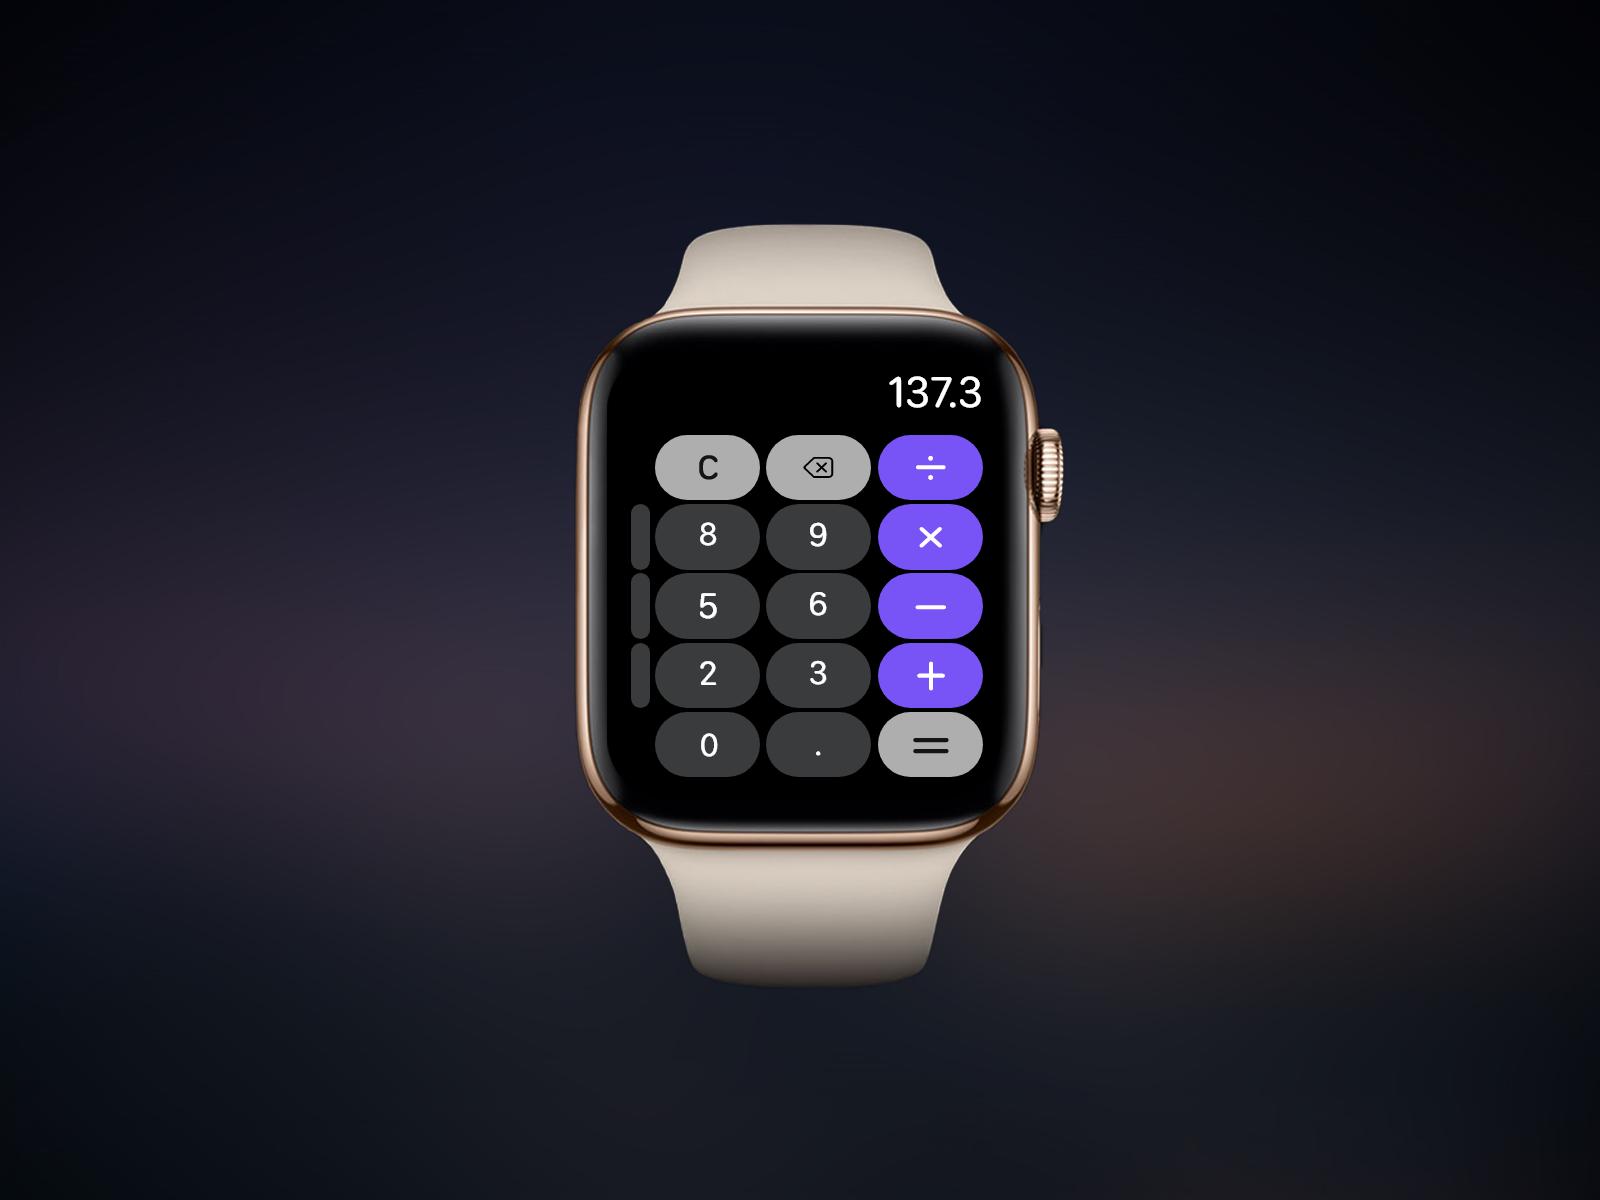 Apple Watch Calculator - Daily UI 4 by Abdelrahman Abudahesh